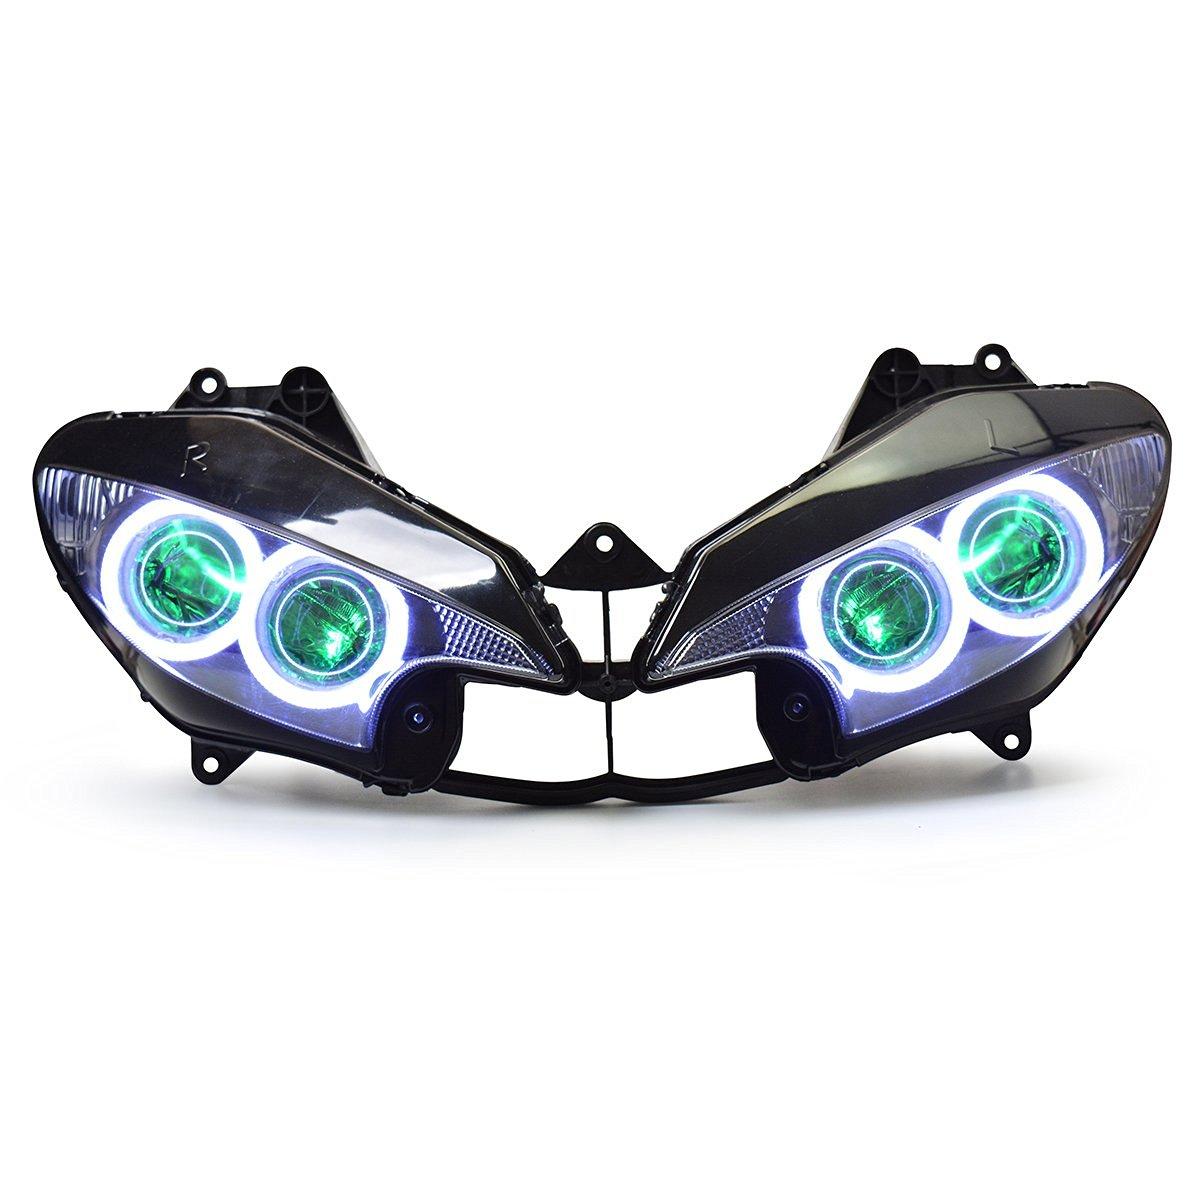 KT LED Headlight Assembly for Yamaha R6S 2006-2009 Green Angel Eye